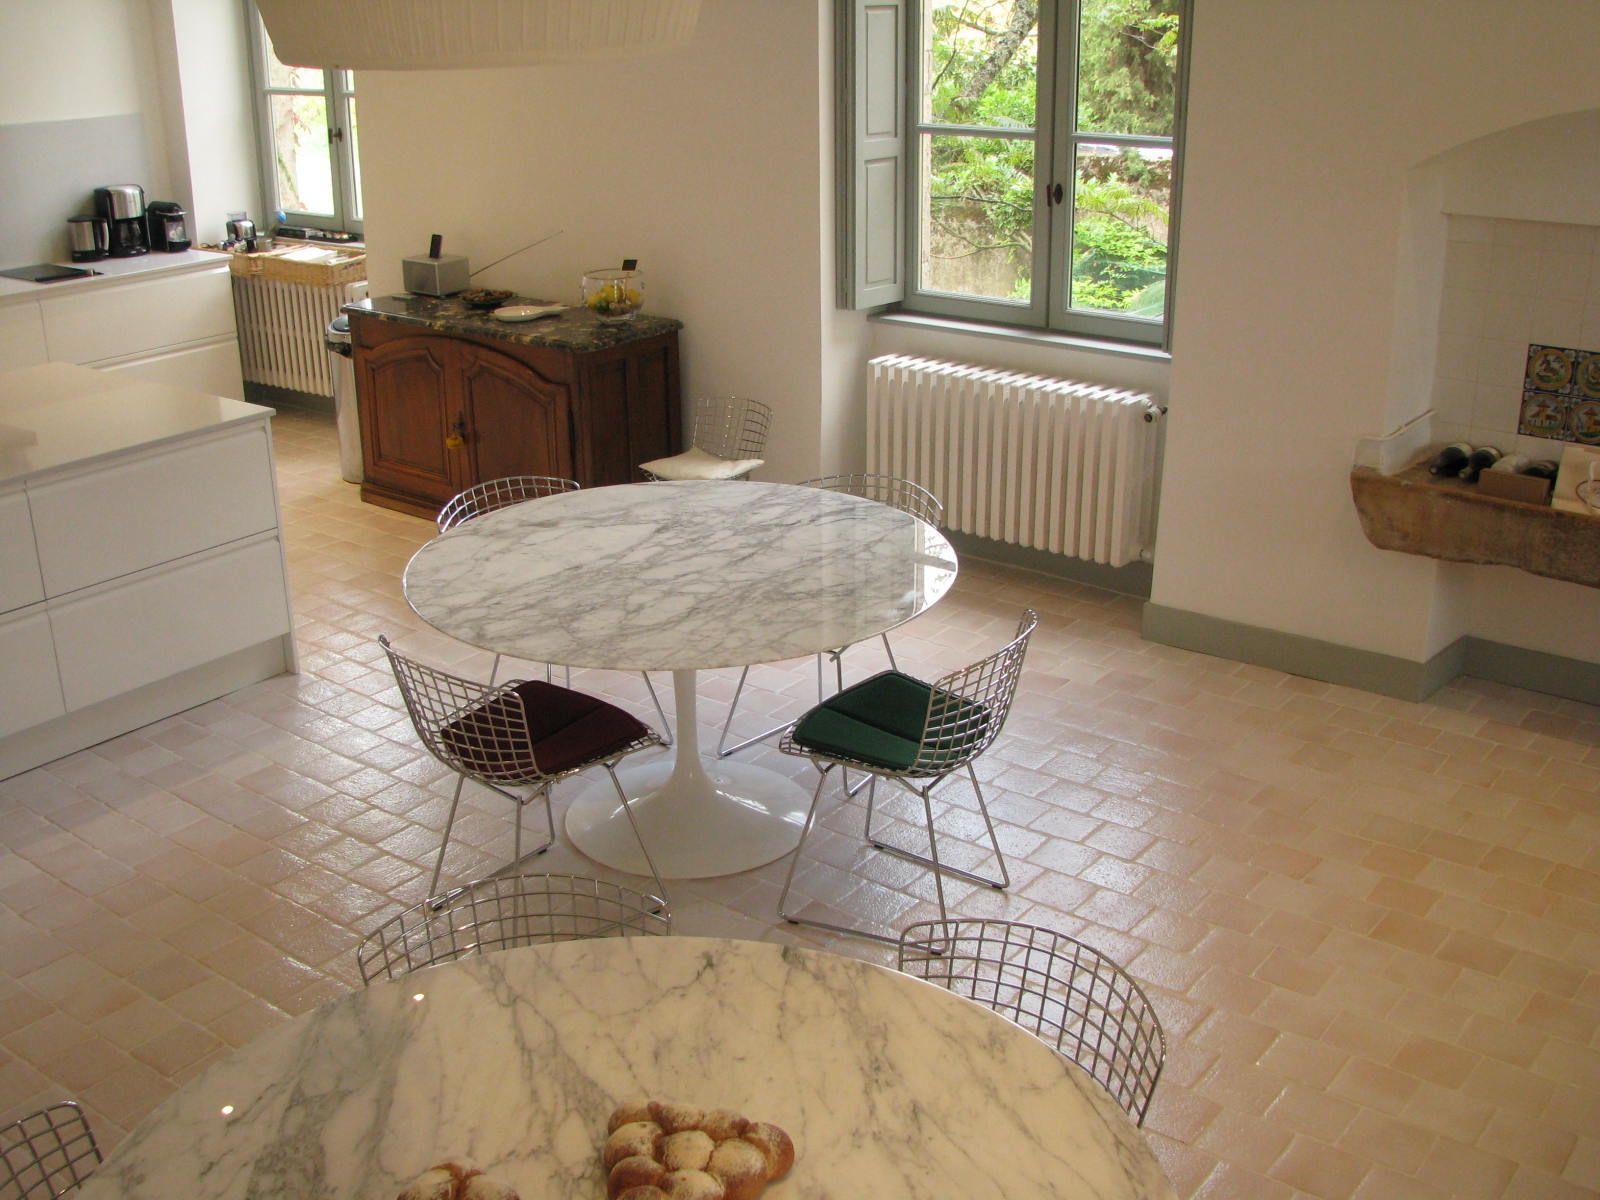 Terracotta Floor Dining Room Sol Terre Cuite Maill E 16X16Cm